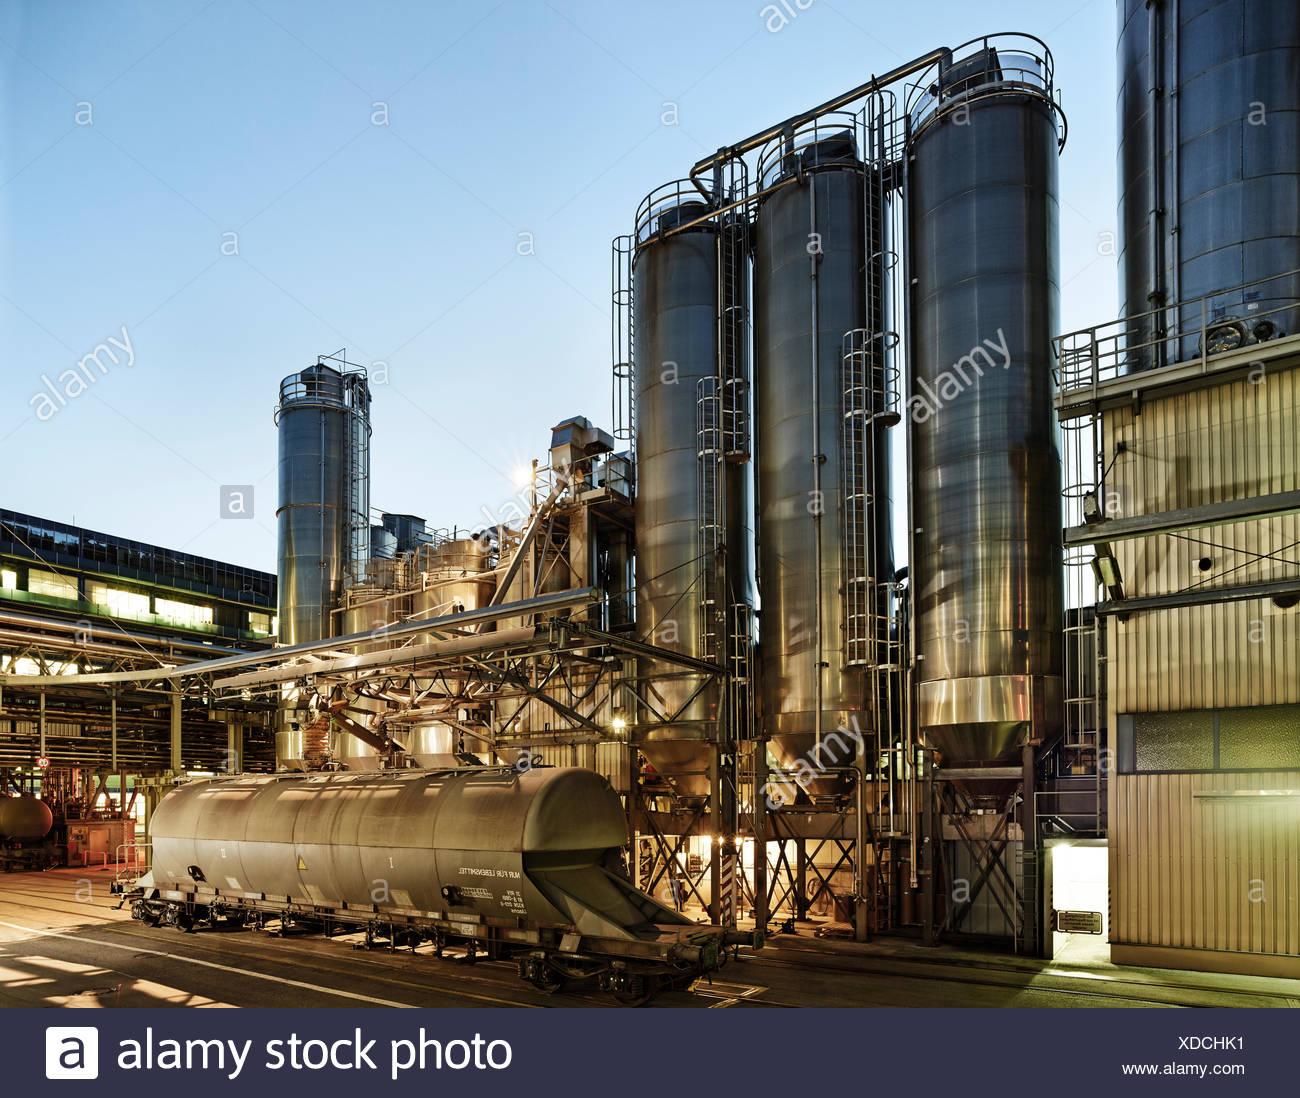 Installations industrielles, installations de production, industrie pharmaceutique, Kundl, Tyrol, Autriche Photo Stock